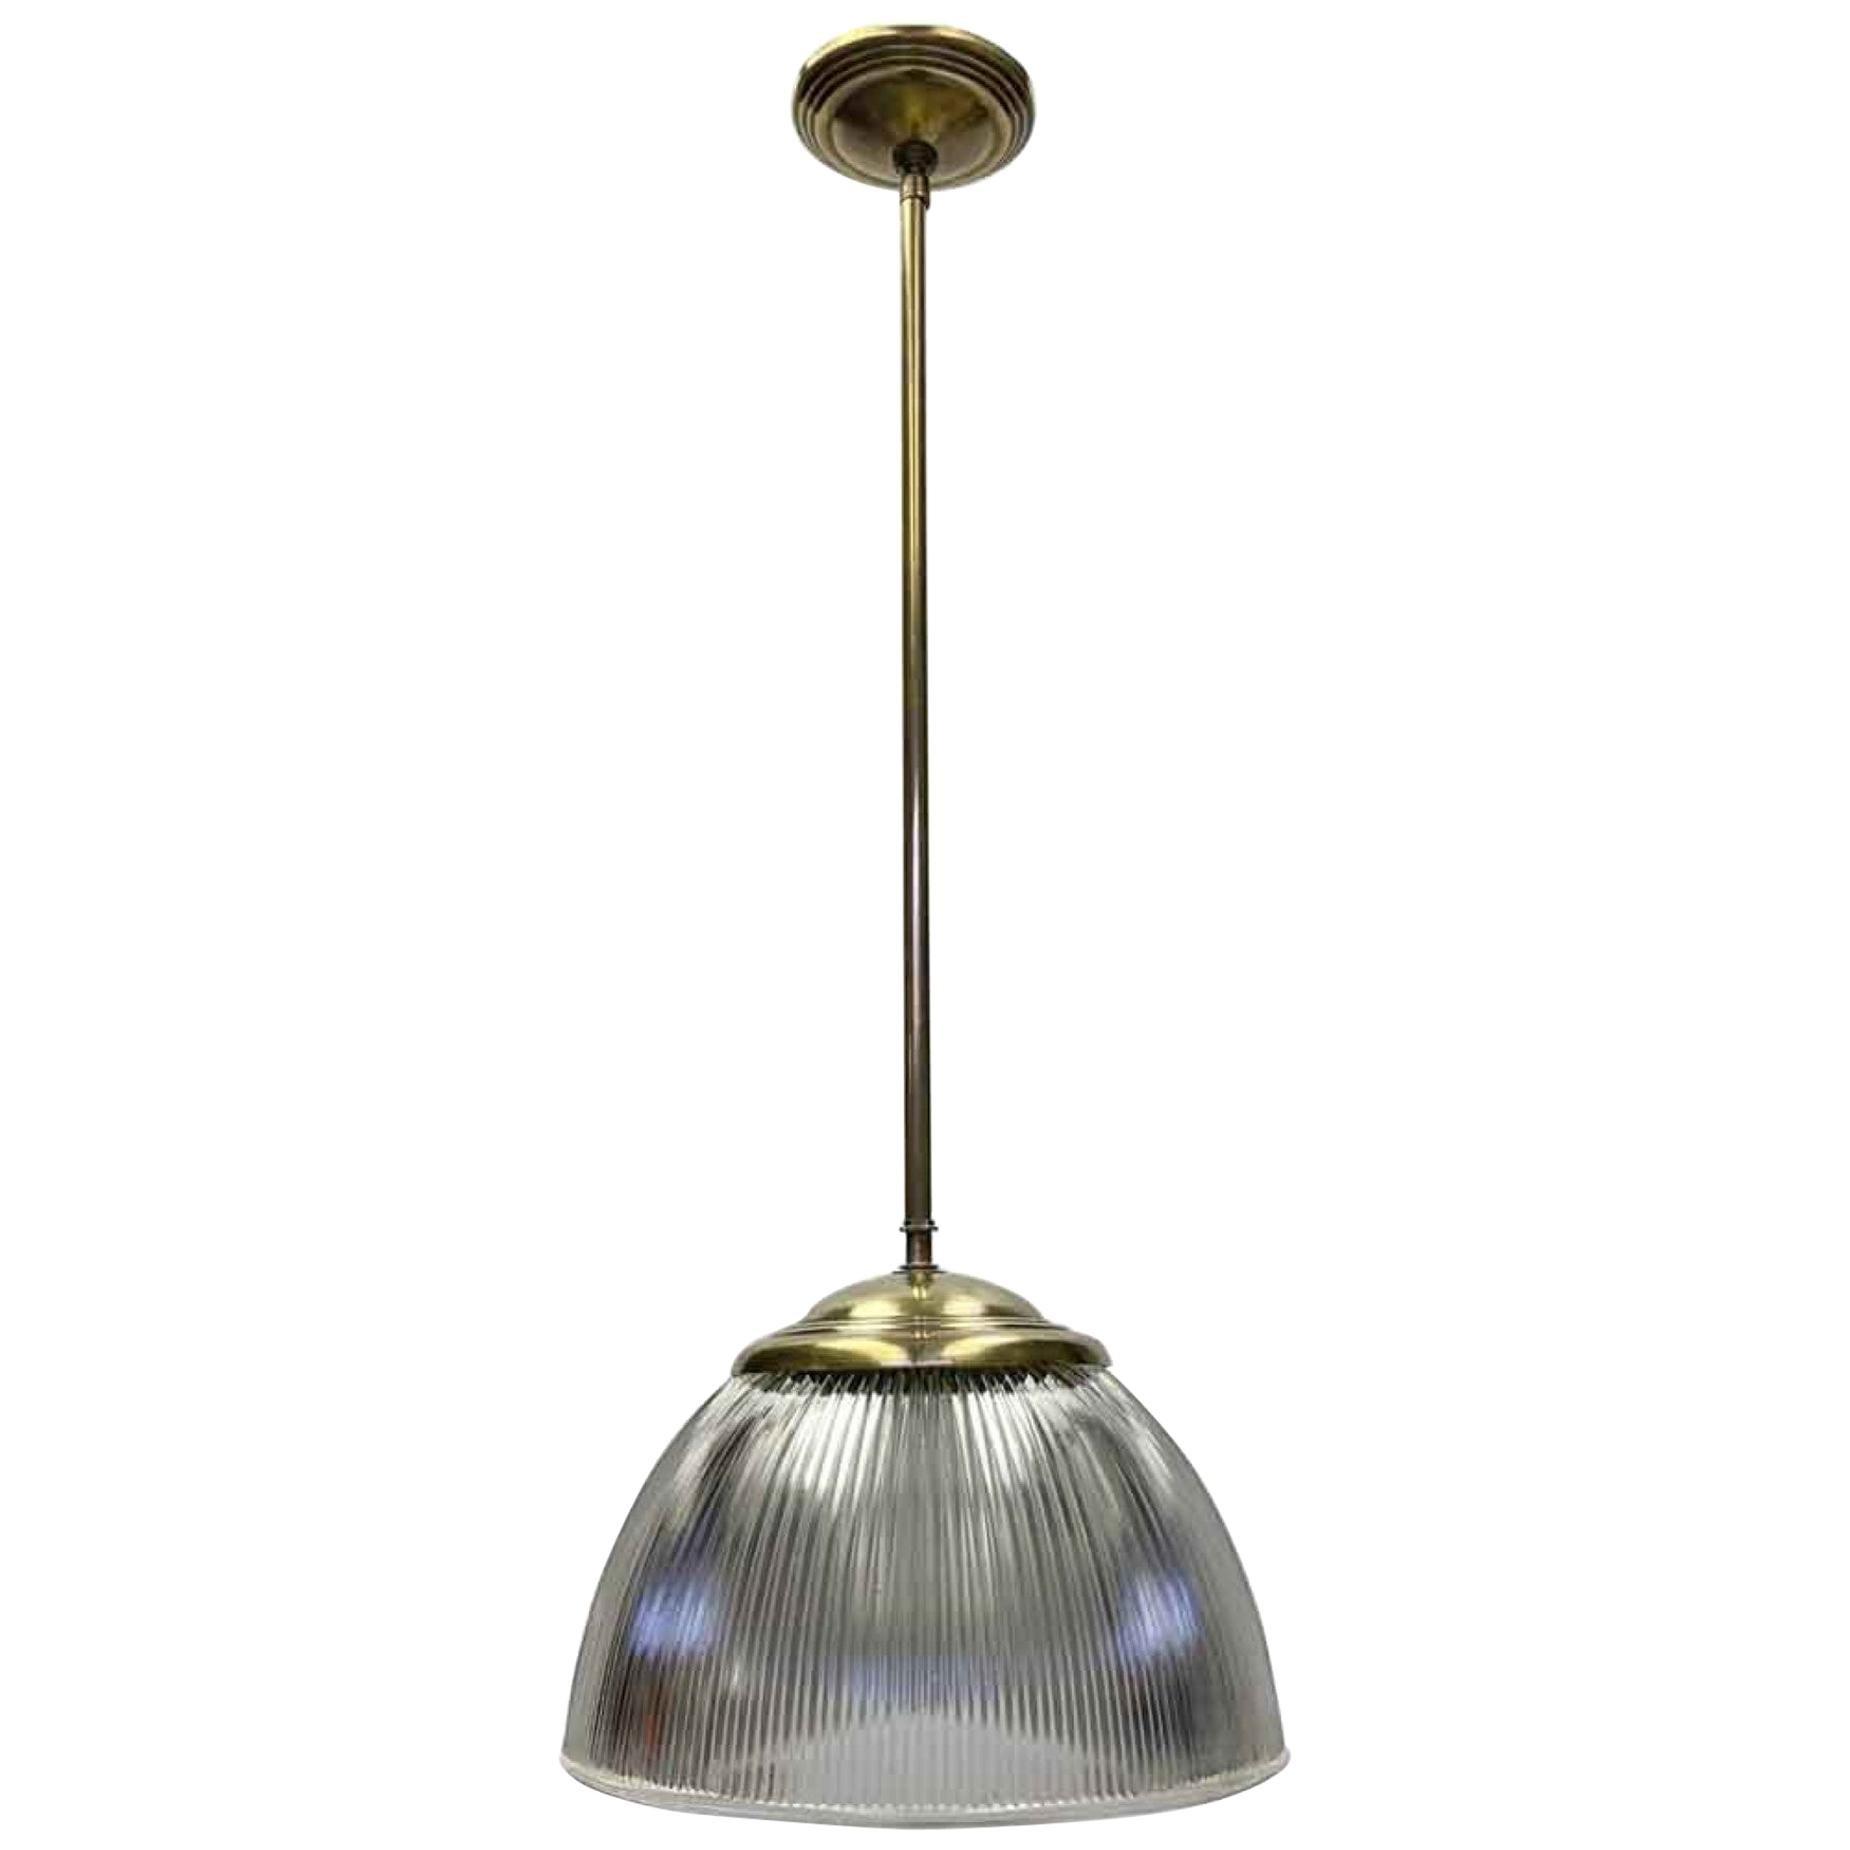 1940s Holophane Globe Pendant Light with Brass Pole Fitter